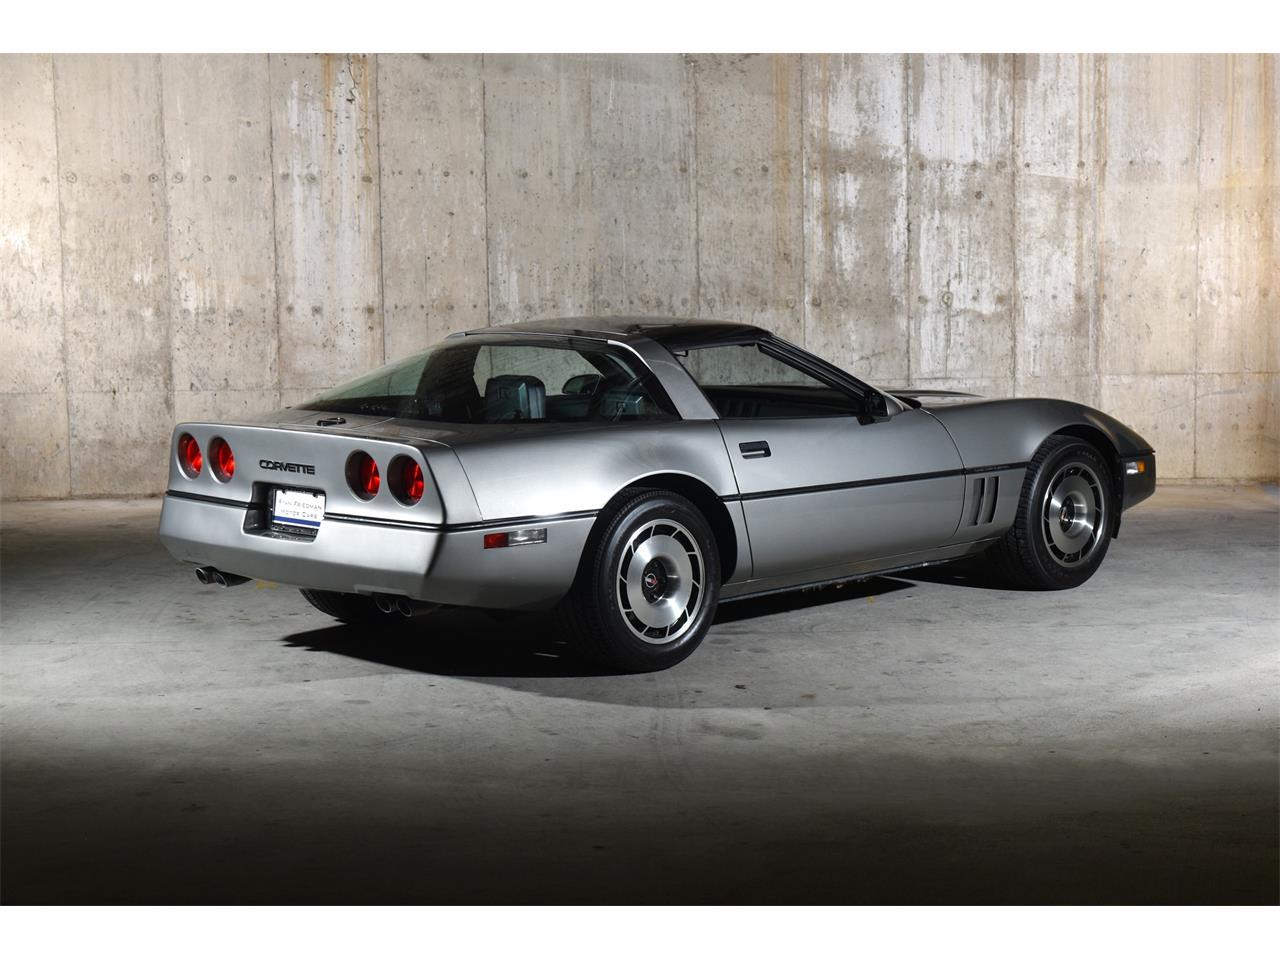 1985 Chevrolet Corvette (CC-1228733) for sale in Valley Stream, New York